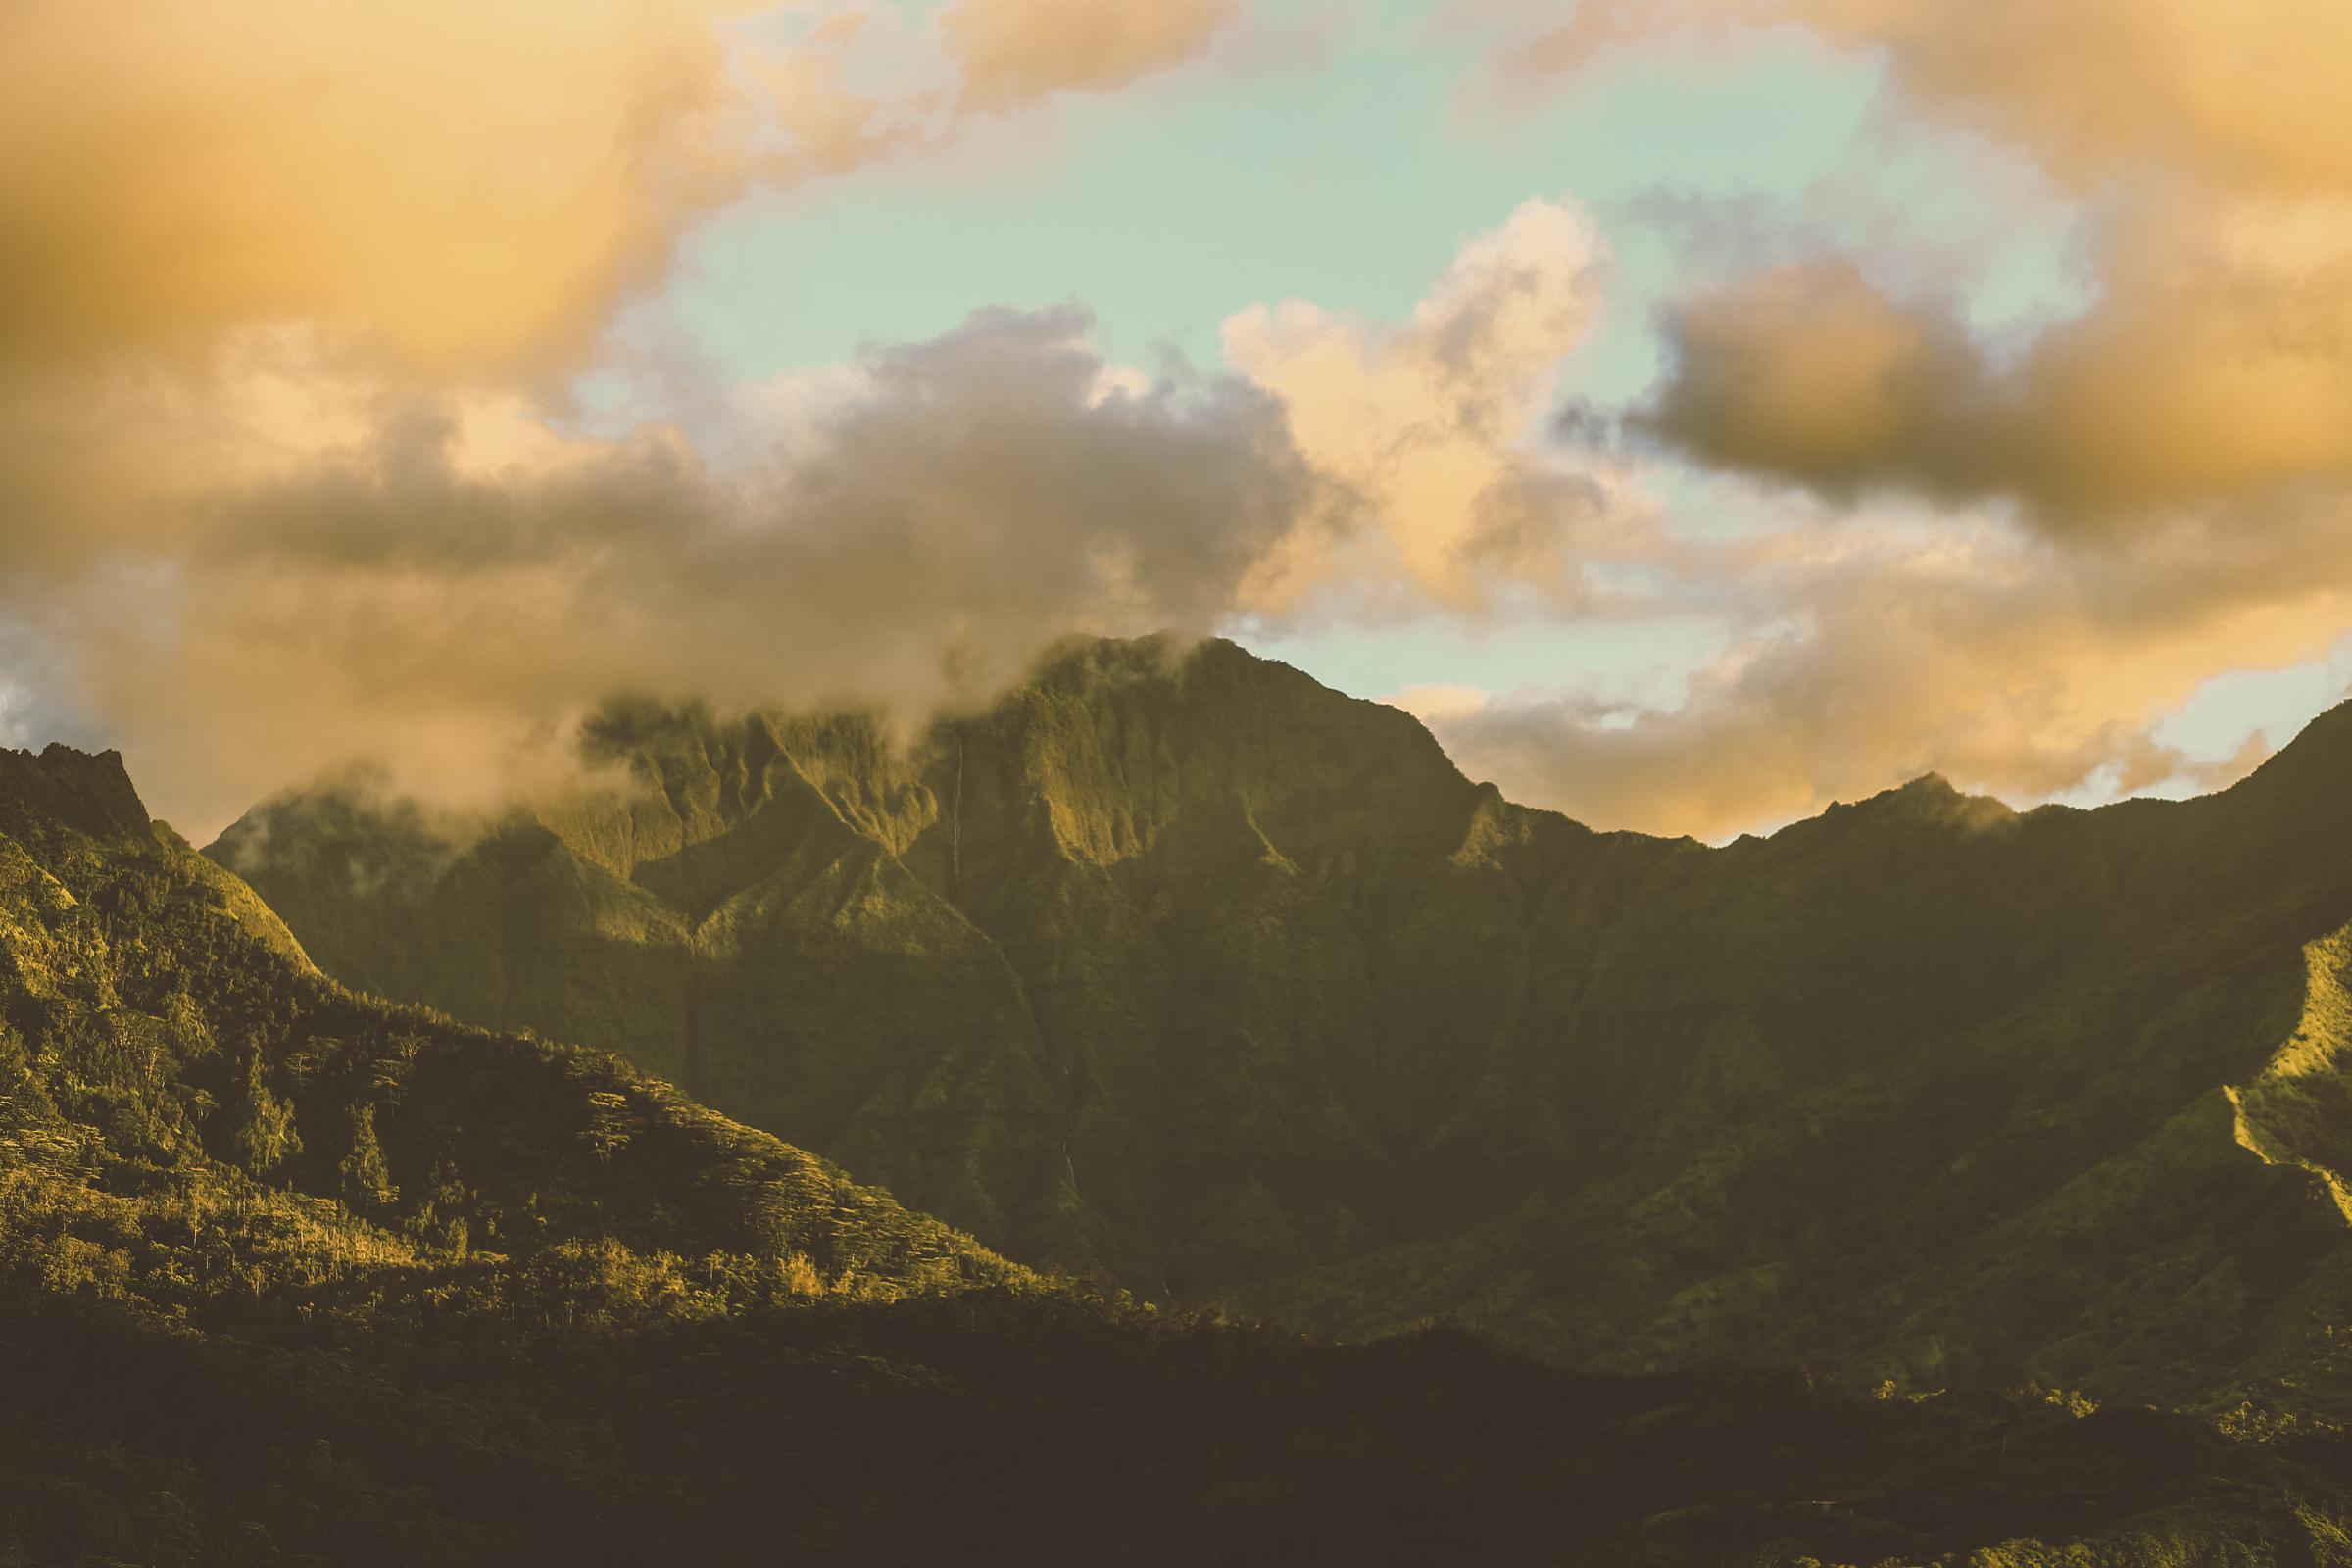 IMG_2764--KAUAI-HAWAII-JENNIFER-PICARD-PHOTOGRAPHY.jpg